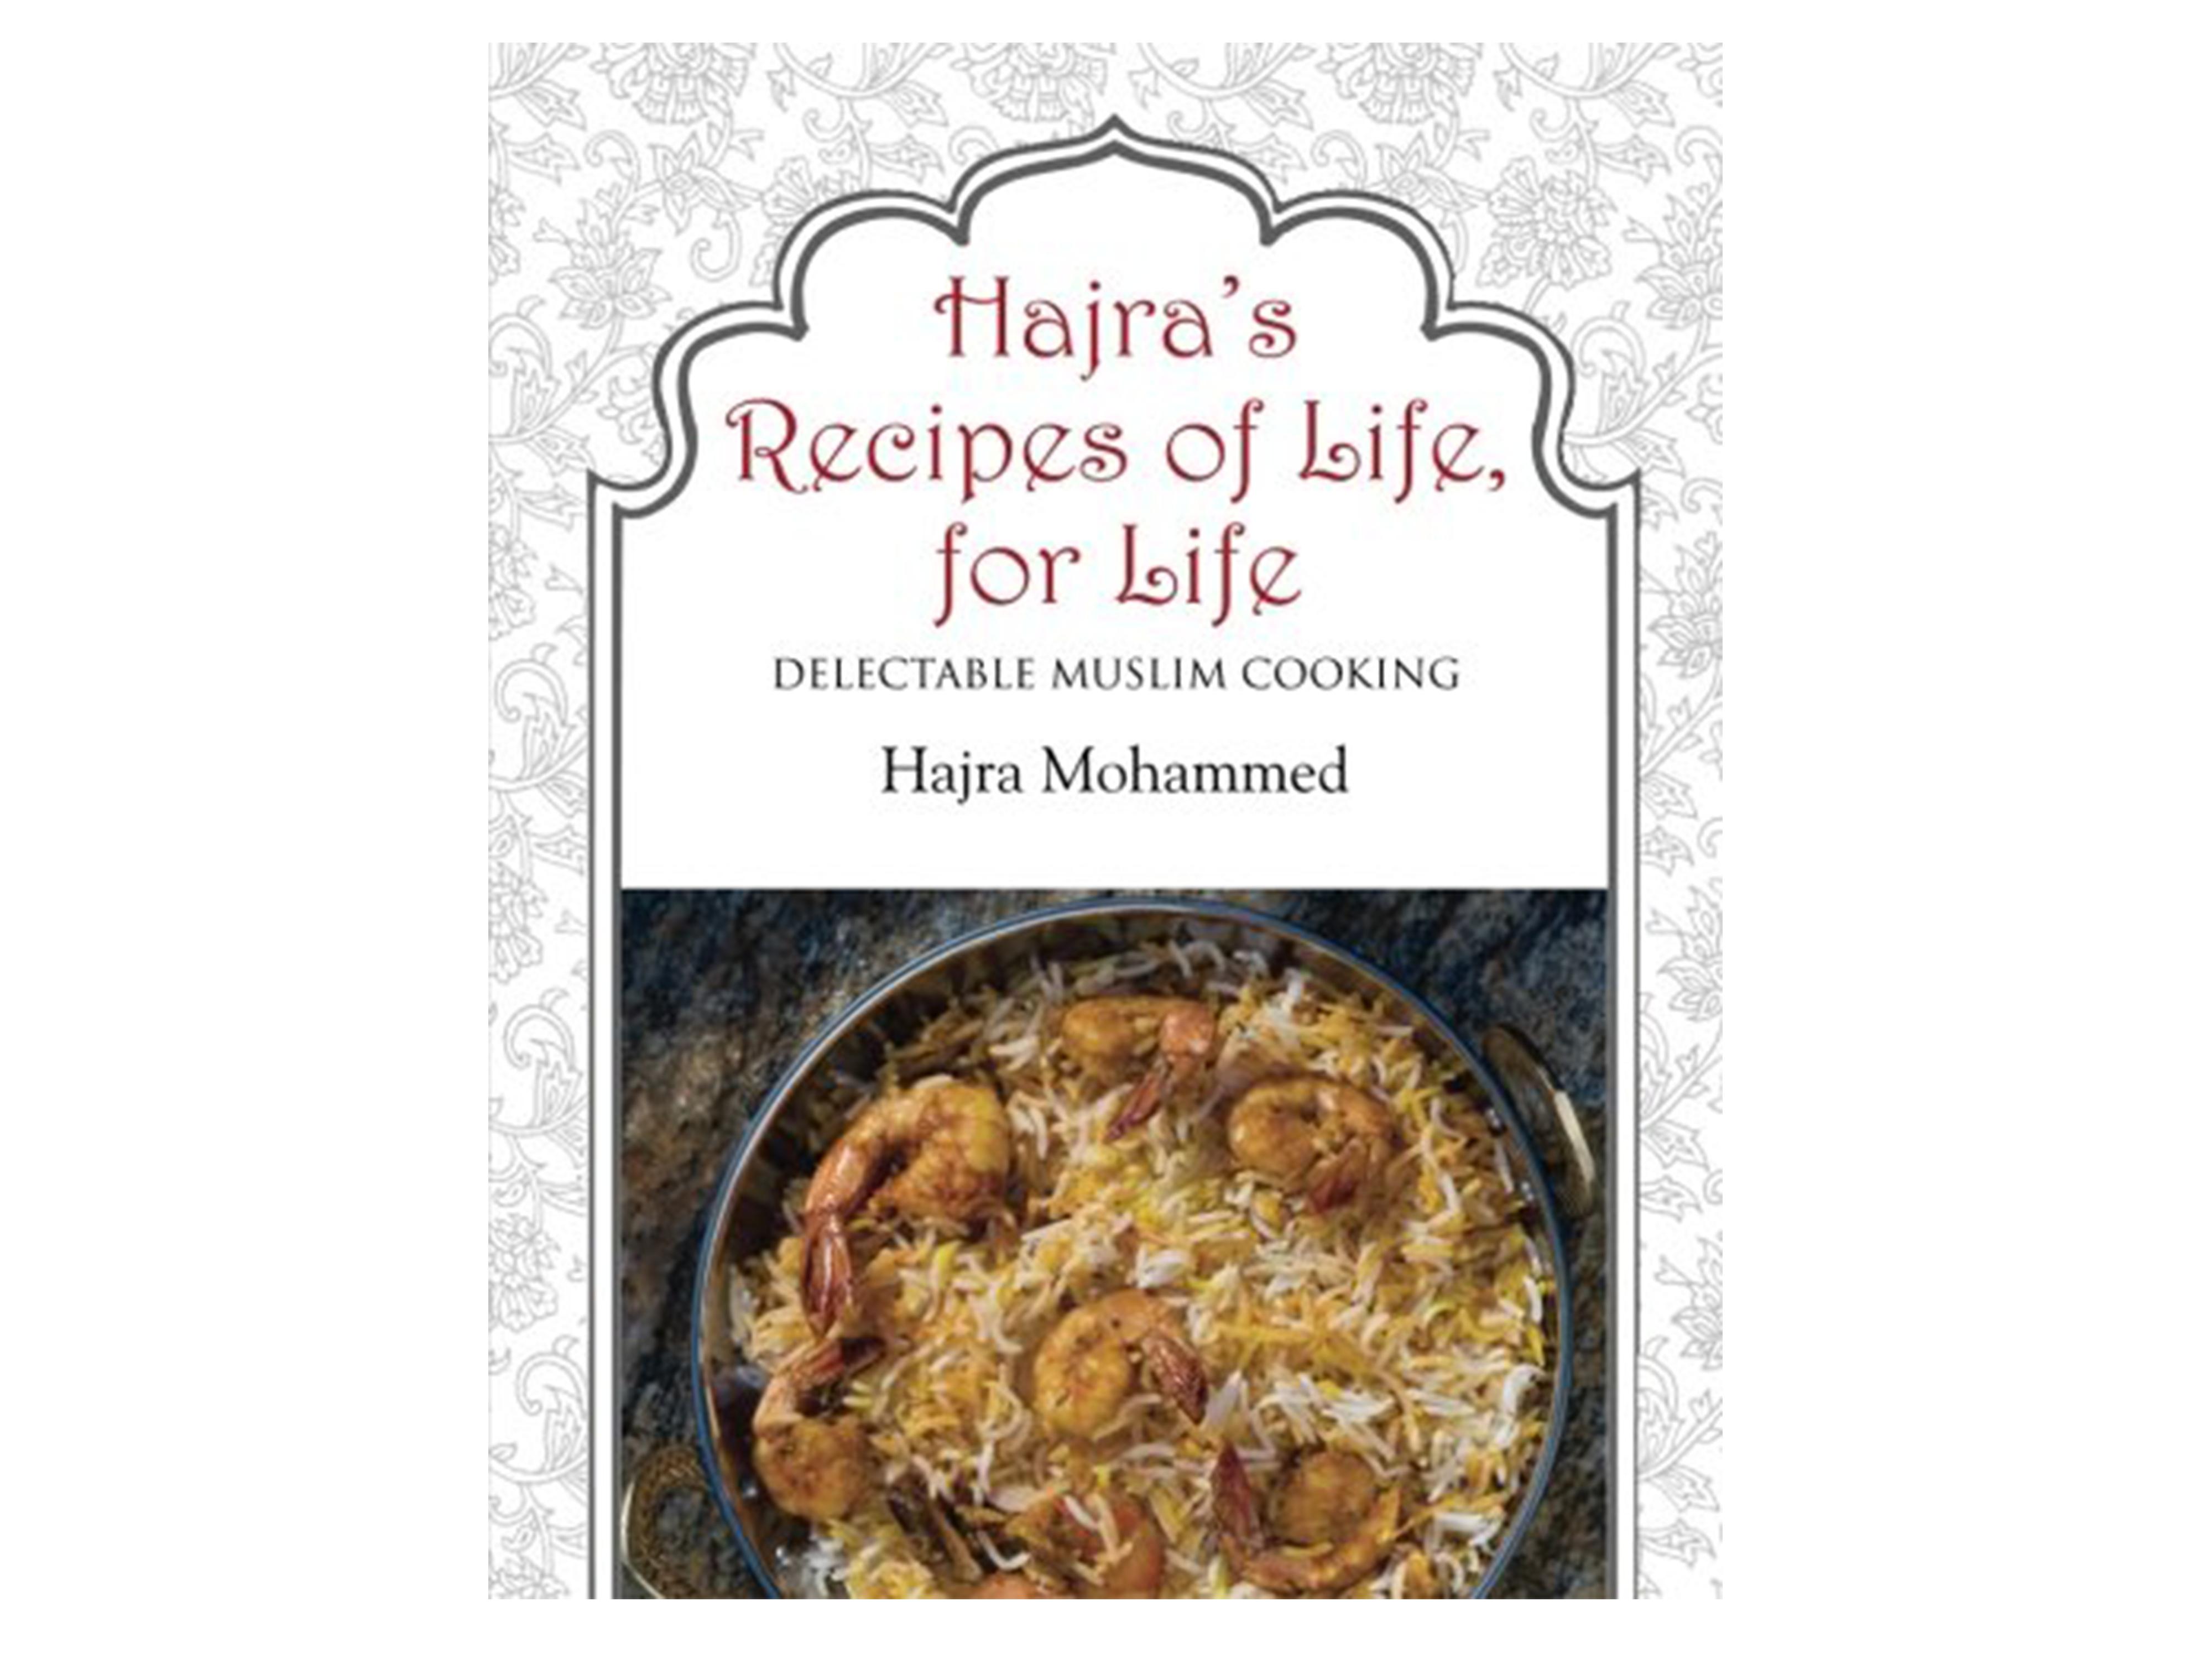 hajras-recipes-of-life